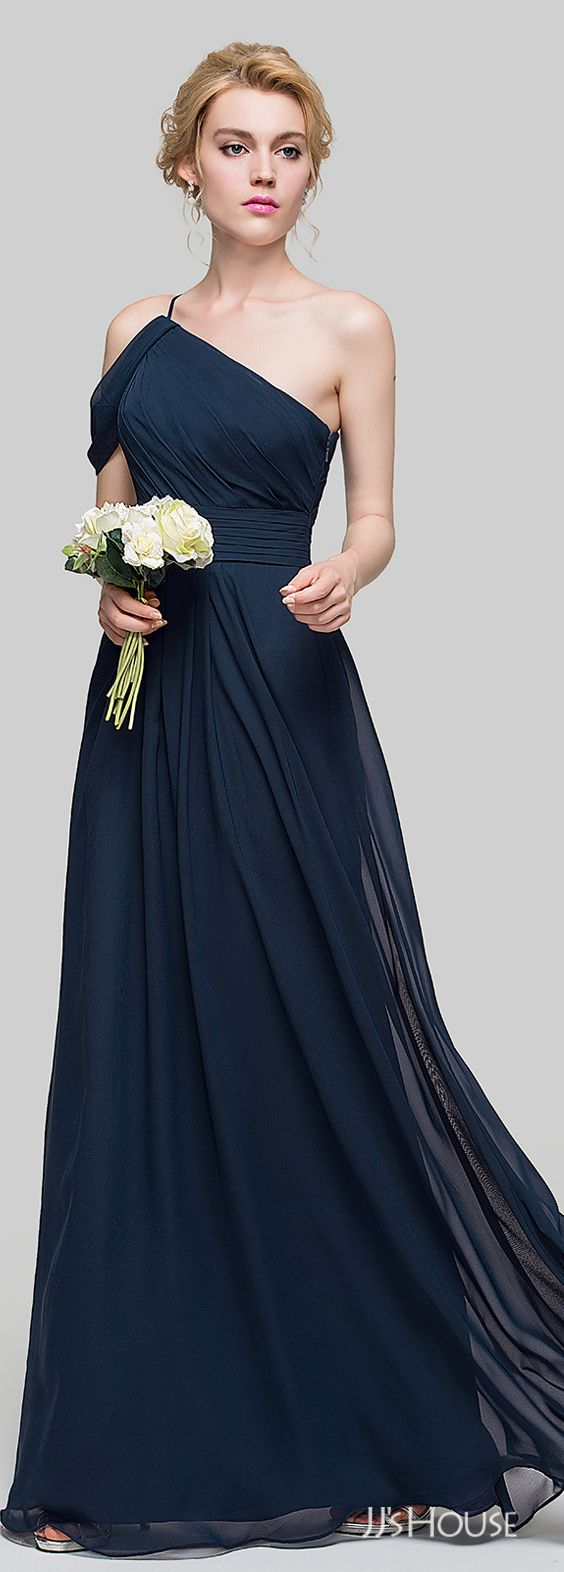 Jjshouse bridesmaid ubranka pinterest gowns wedding and prom